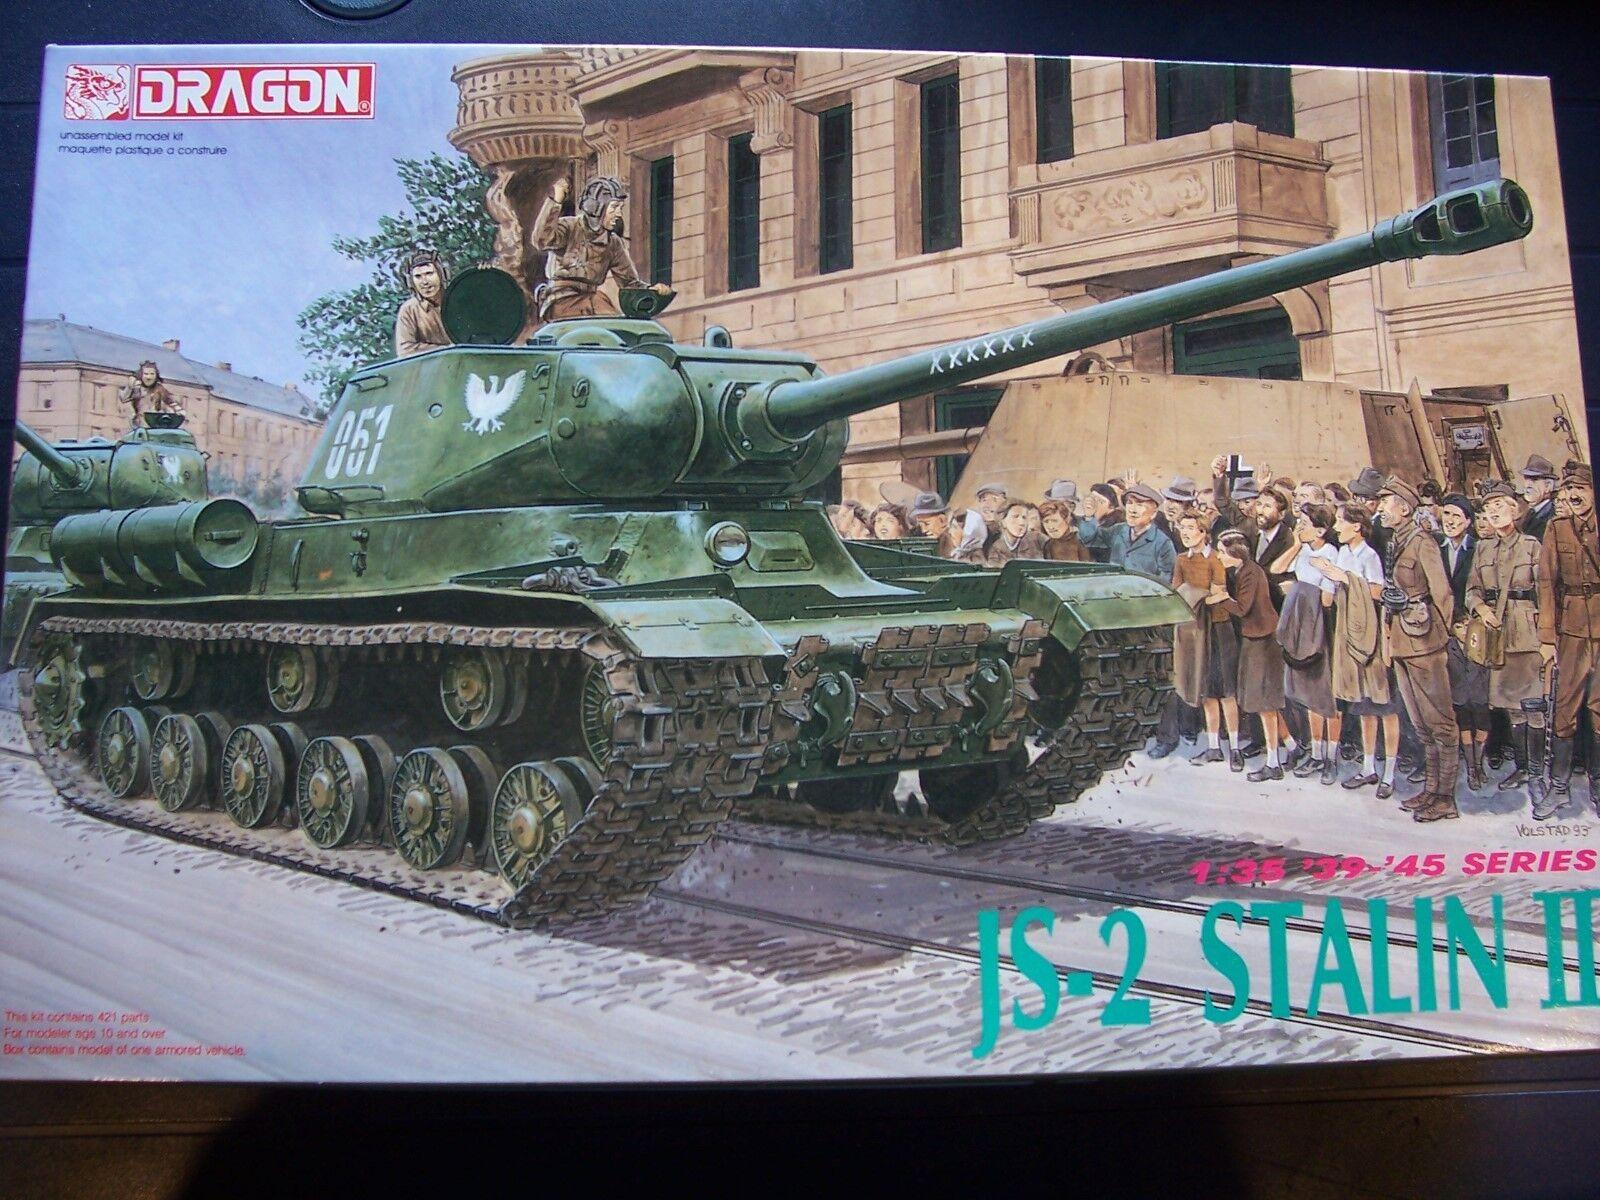 Dragon 6012 kpz. JS-2 Stalin II 1 3 5 OVP 242